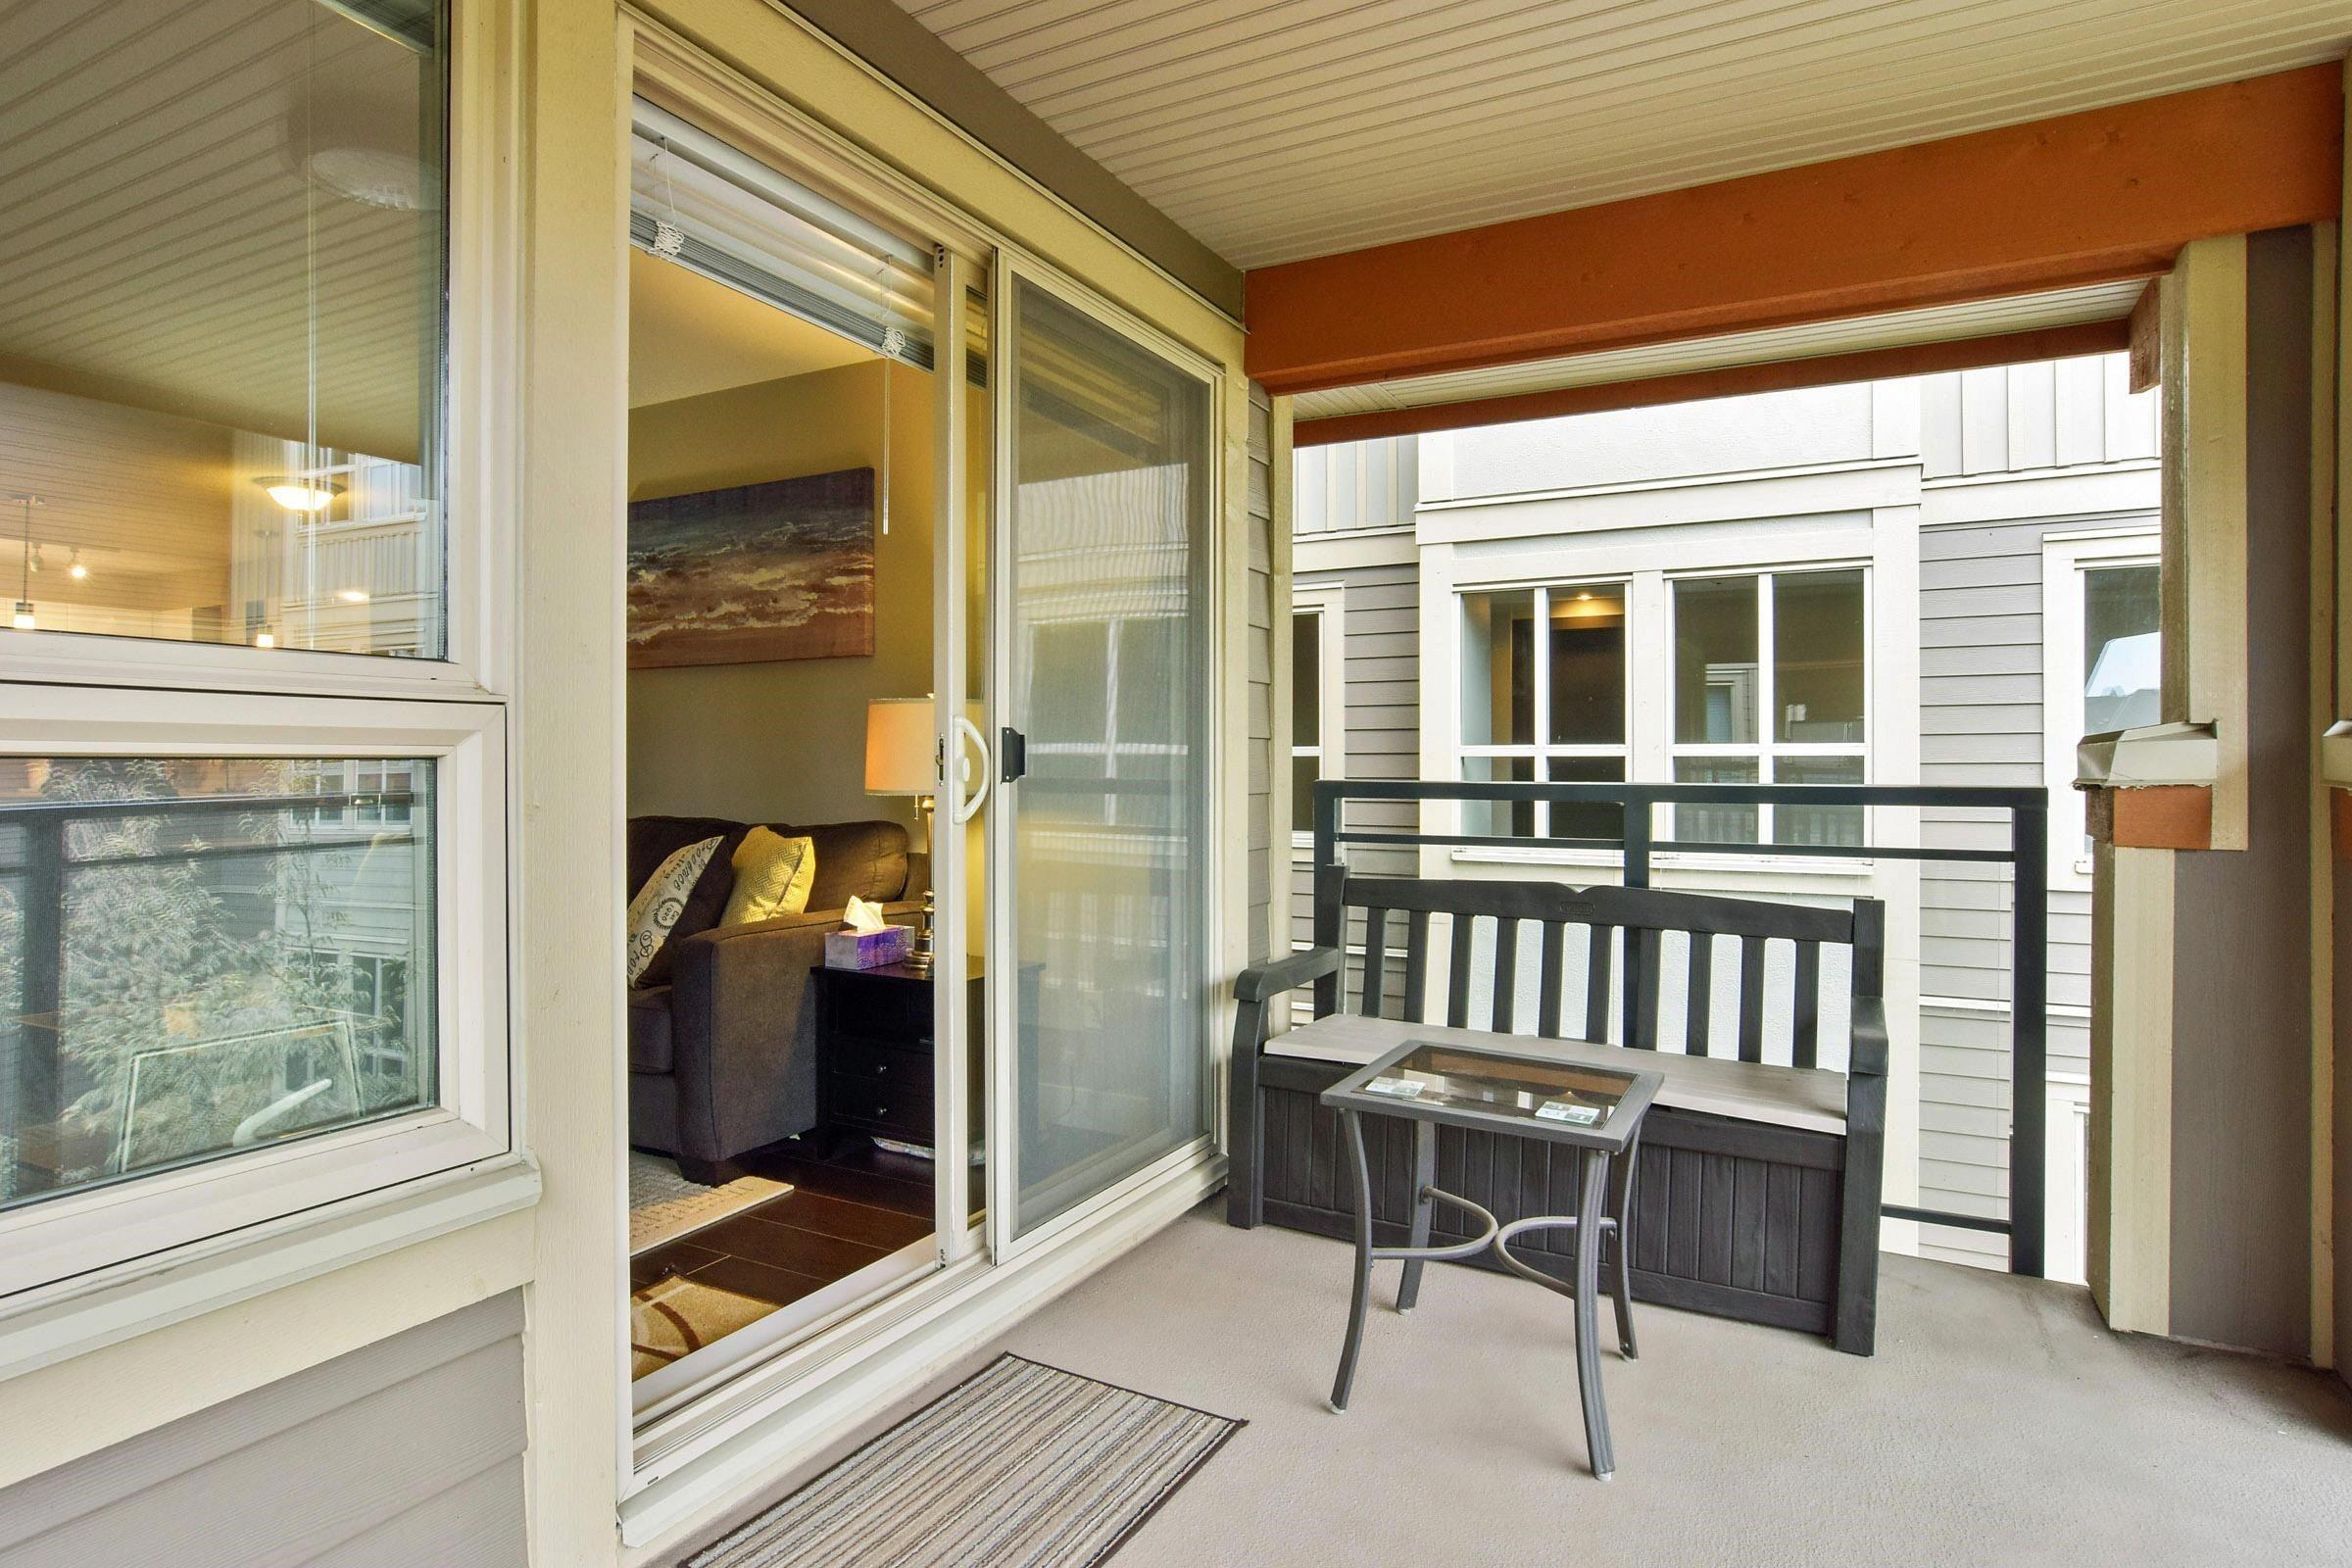 301 7131 STRIDE AVENUE - Edmonds BE Apartment/Condo for sale, 1 Bedroom (R2625669) - #16